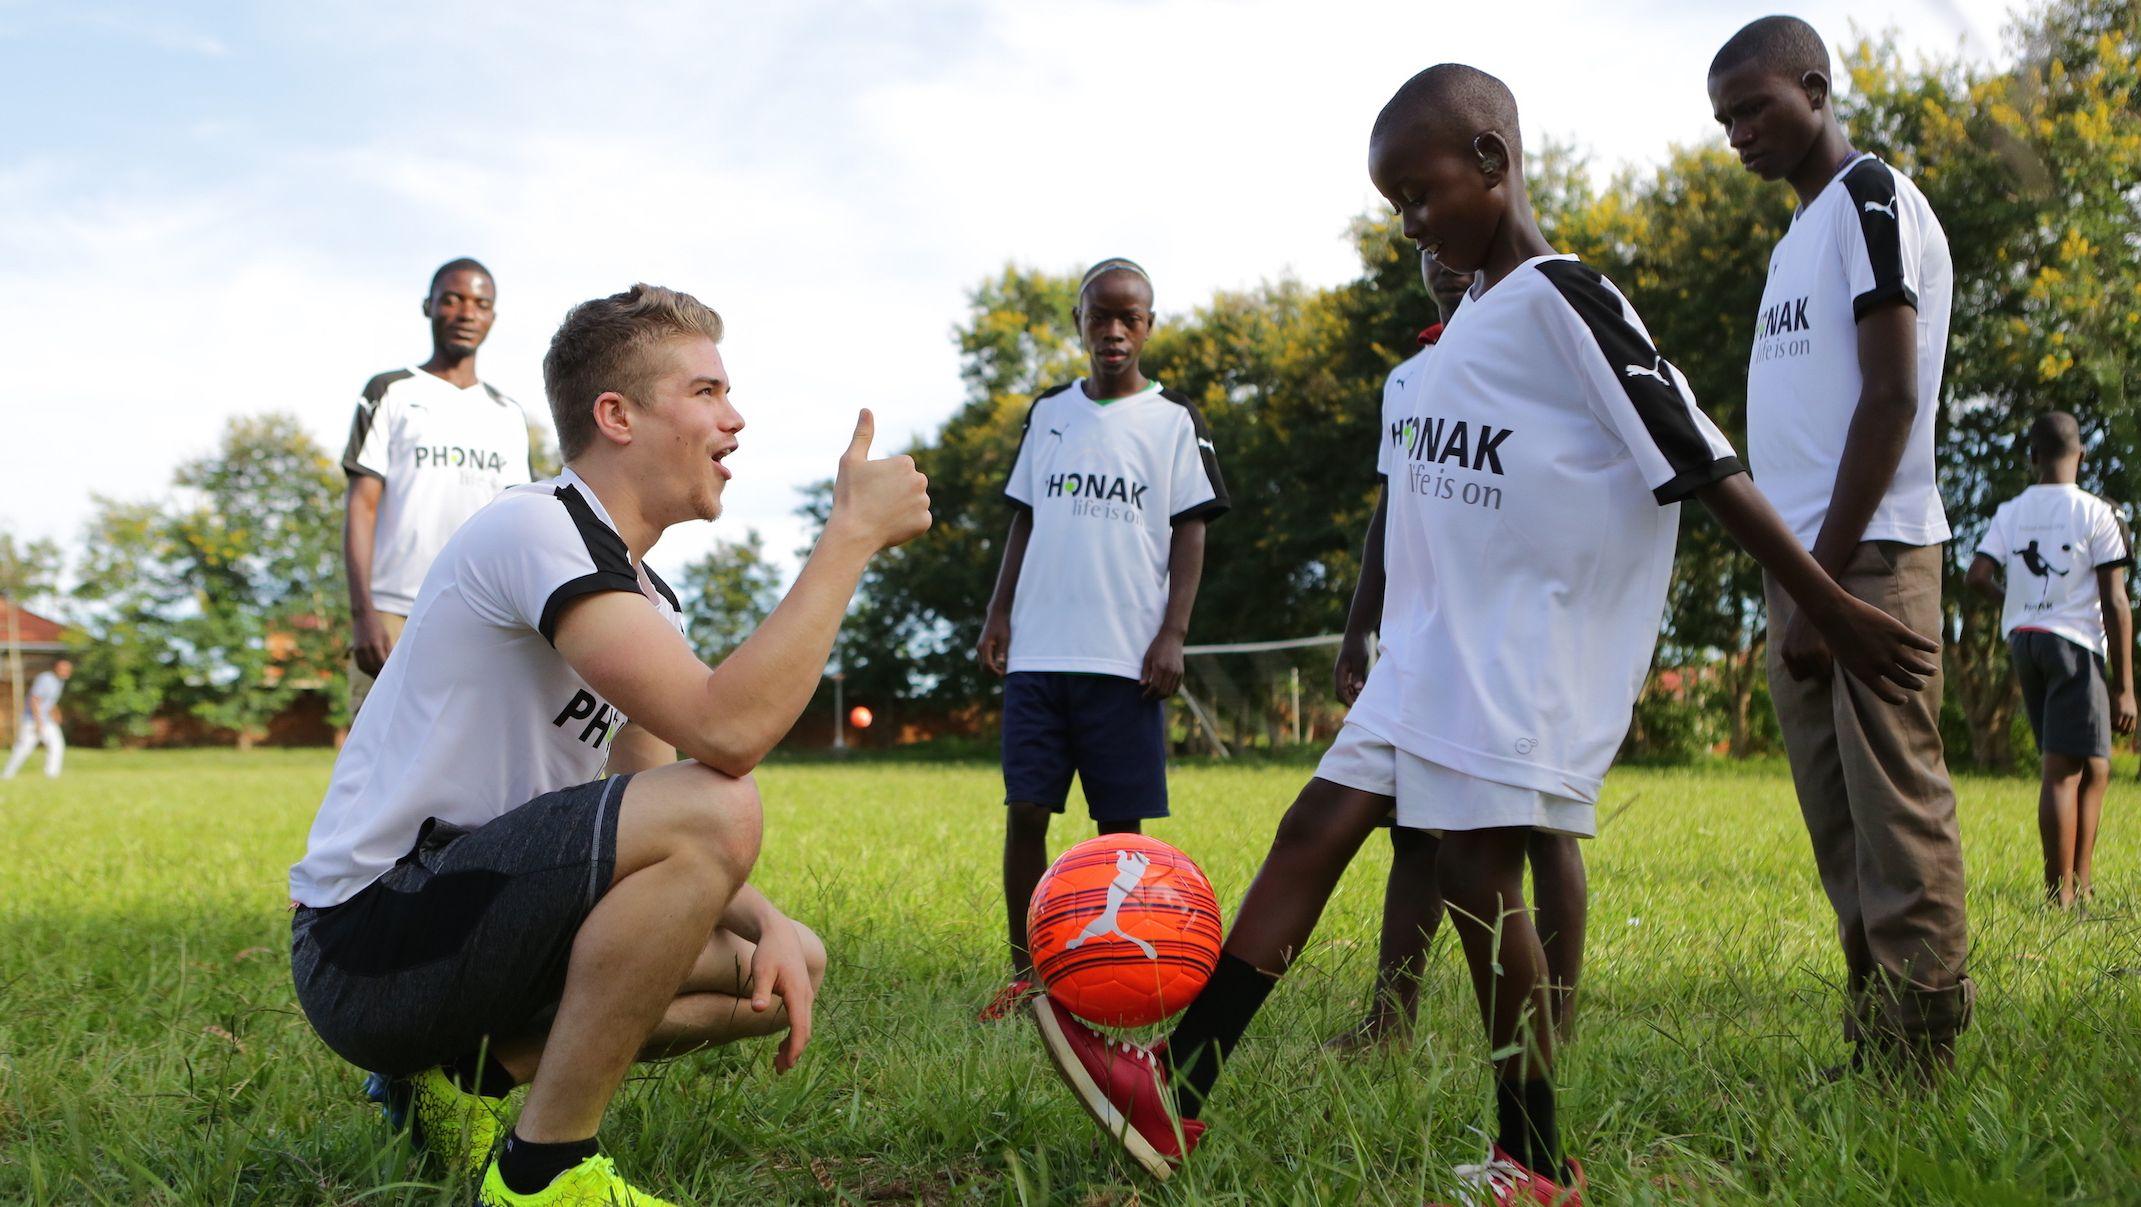 "Gehörgeschädigter Fußballer Simon Ollert hilft Kindern in Malawi"""